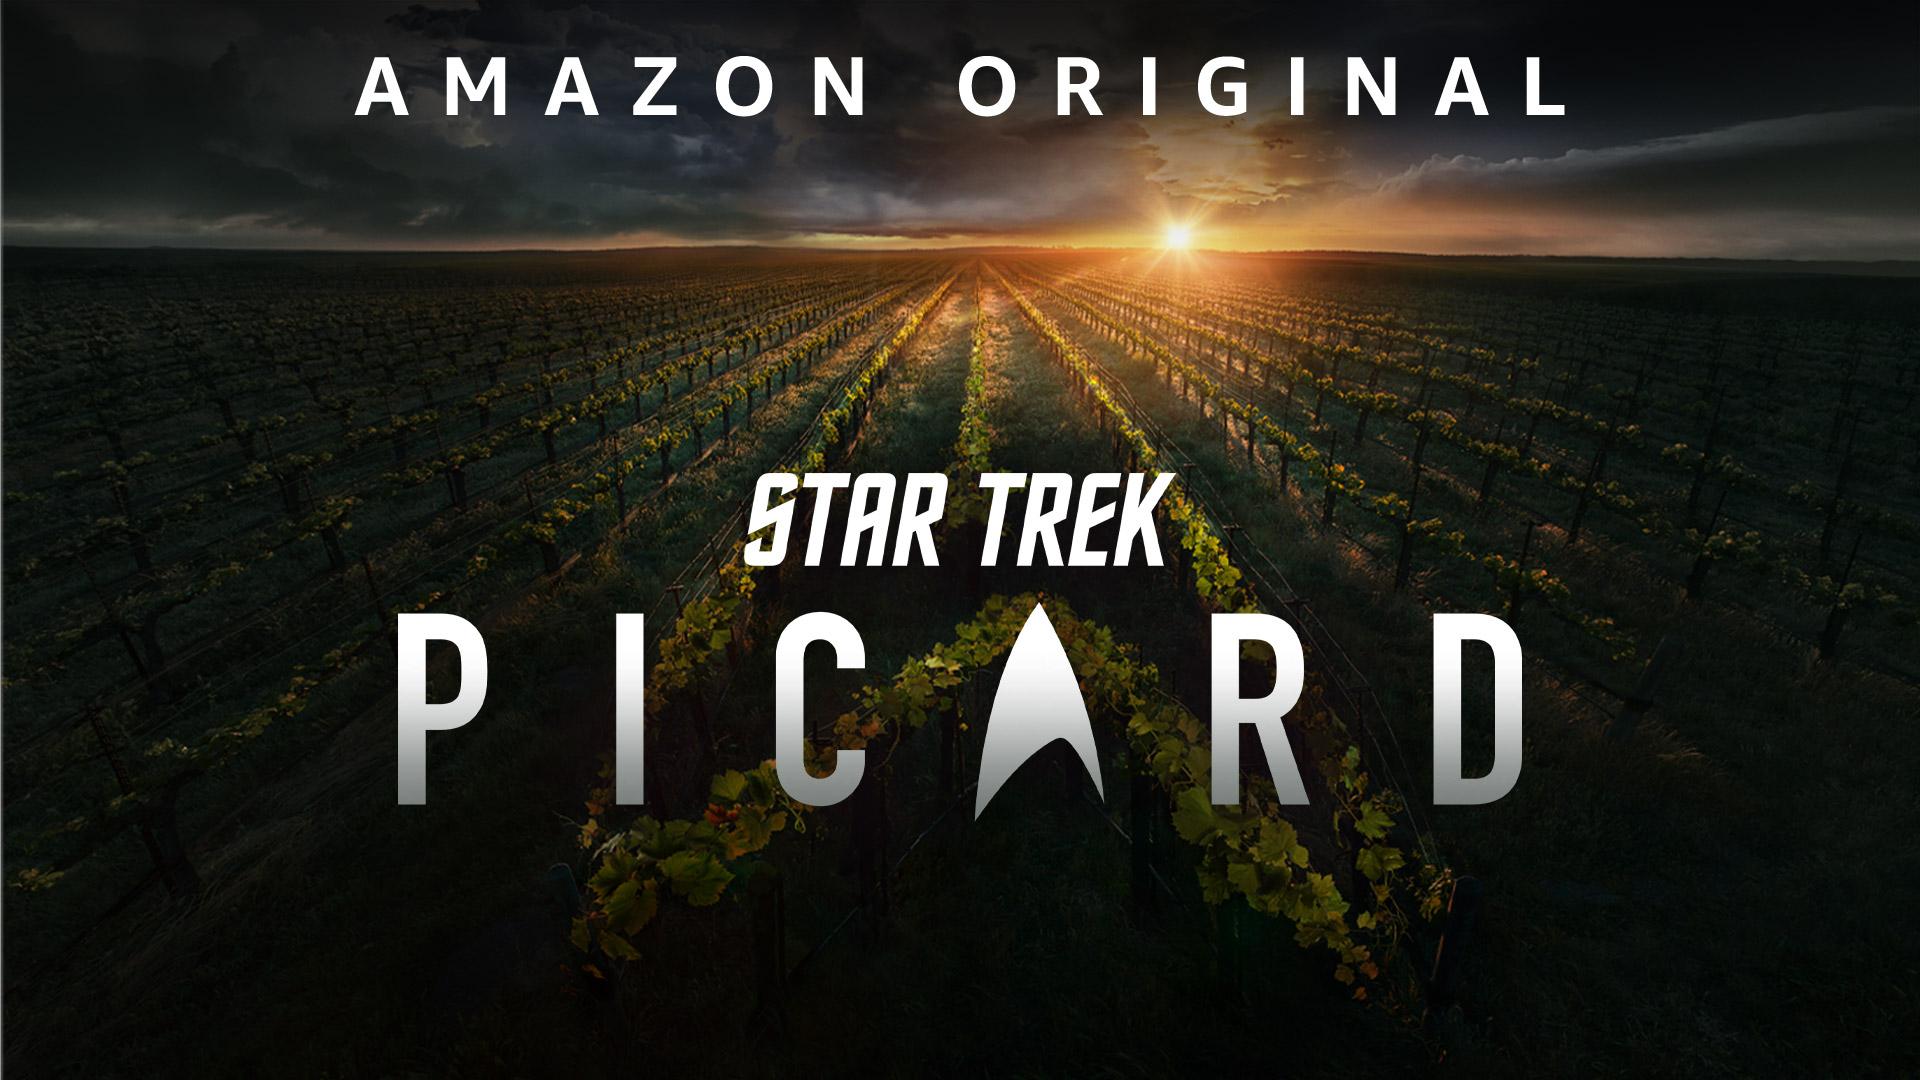 Amazon Co Jp スター トレック ピカード シーズン1 吹替版